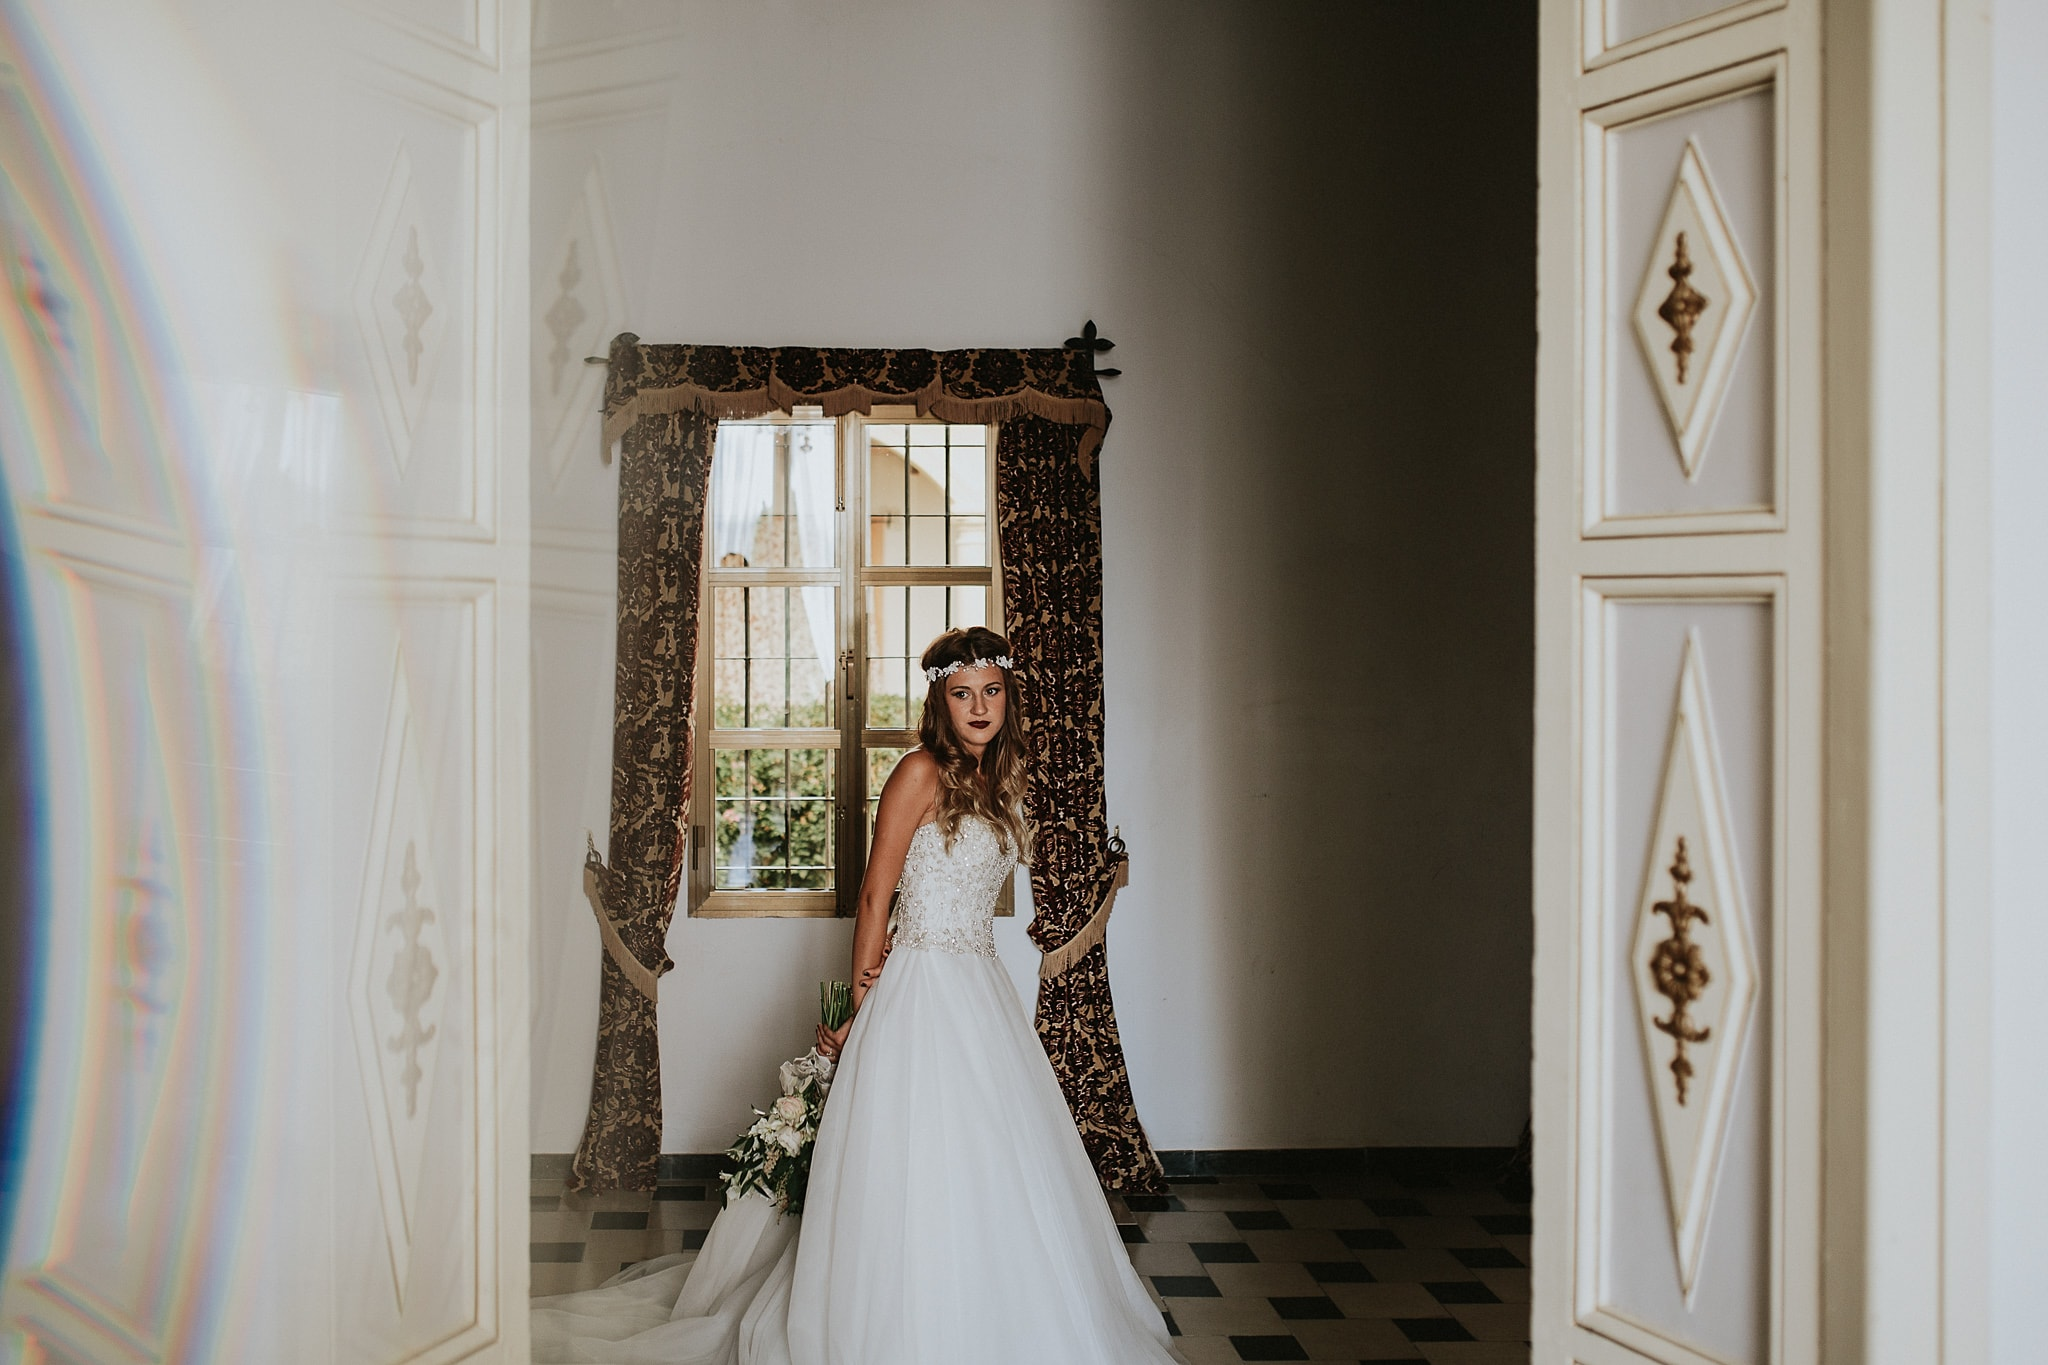 fotografo-bodas-altea-44